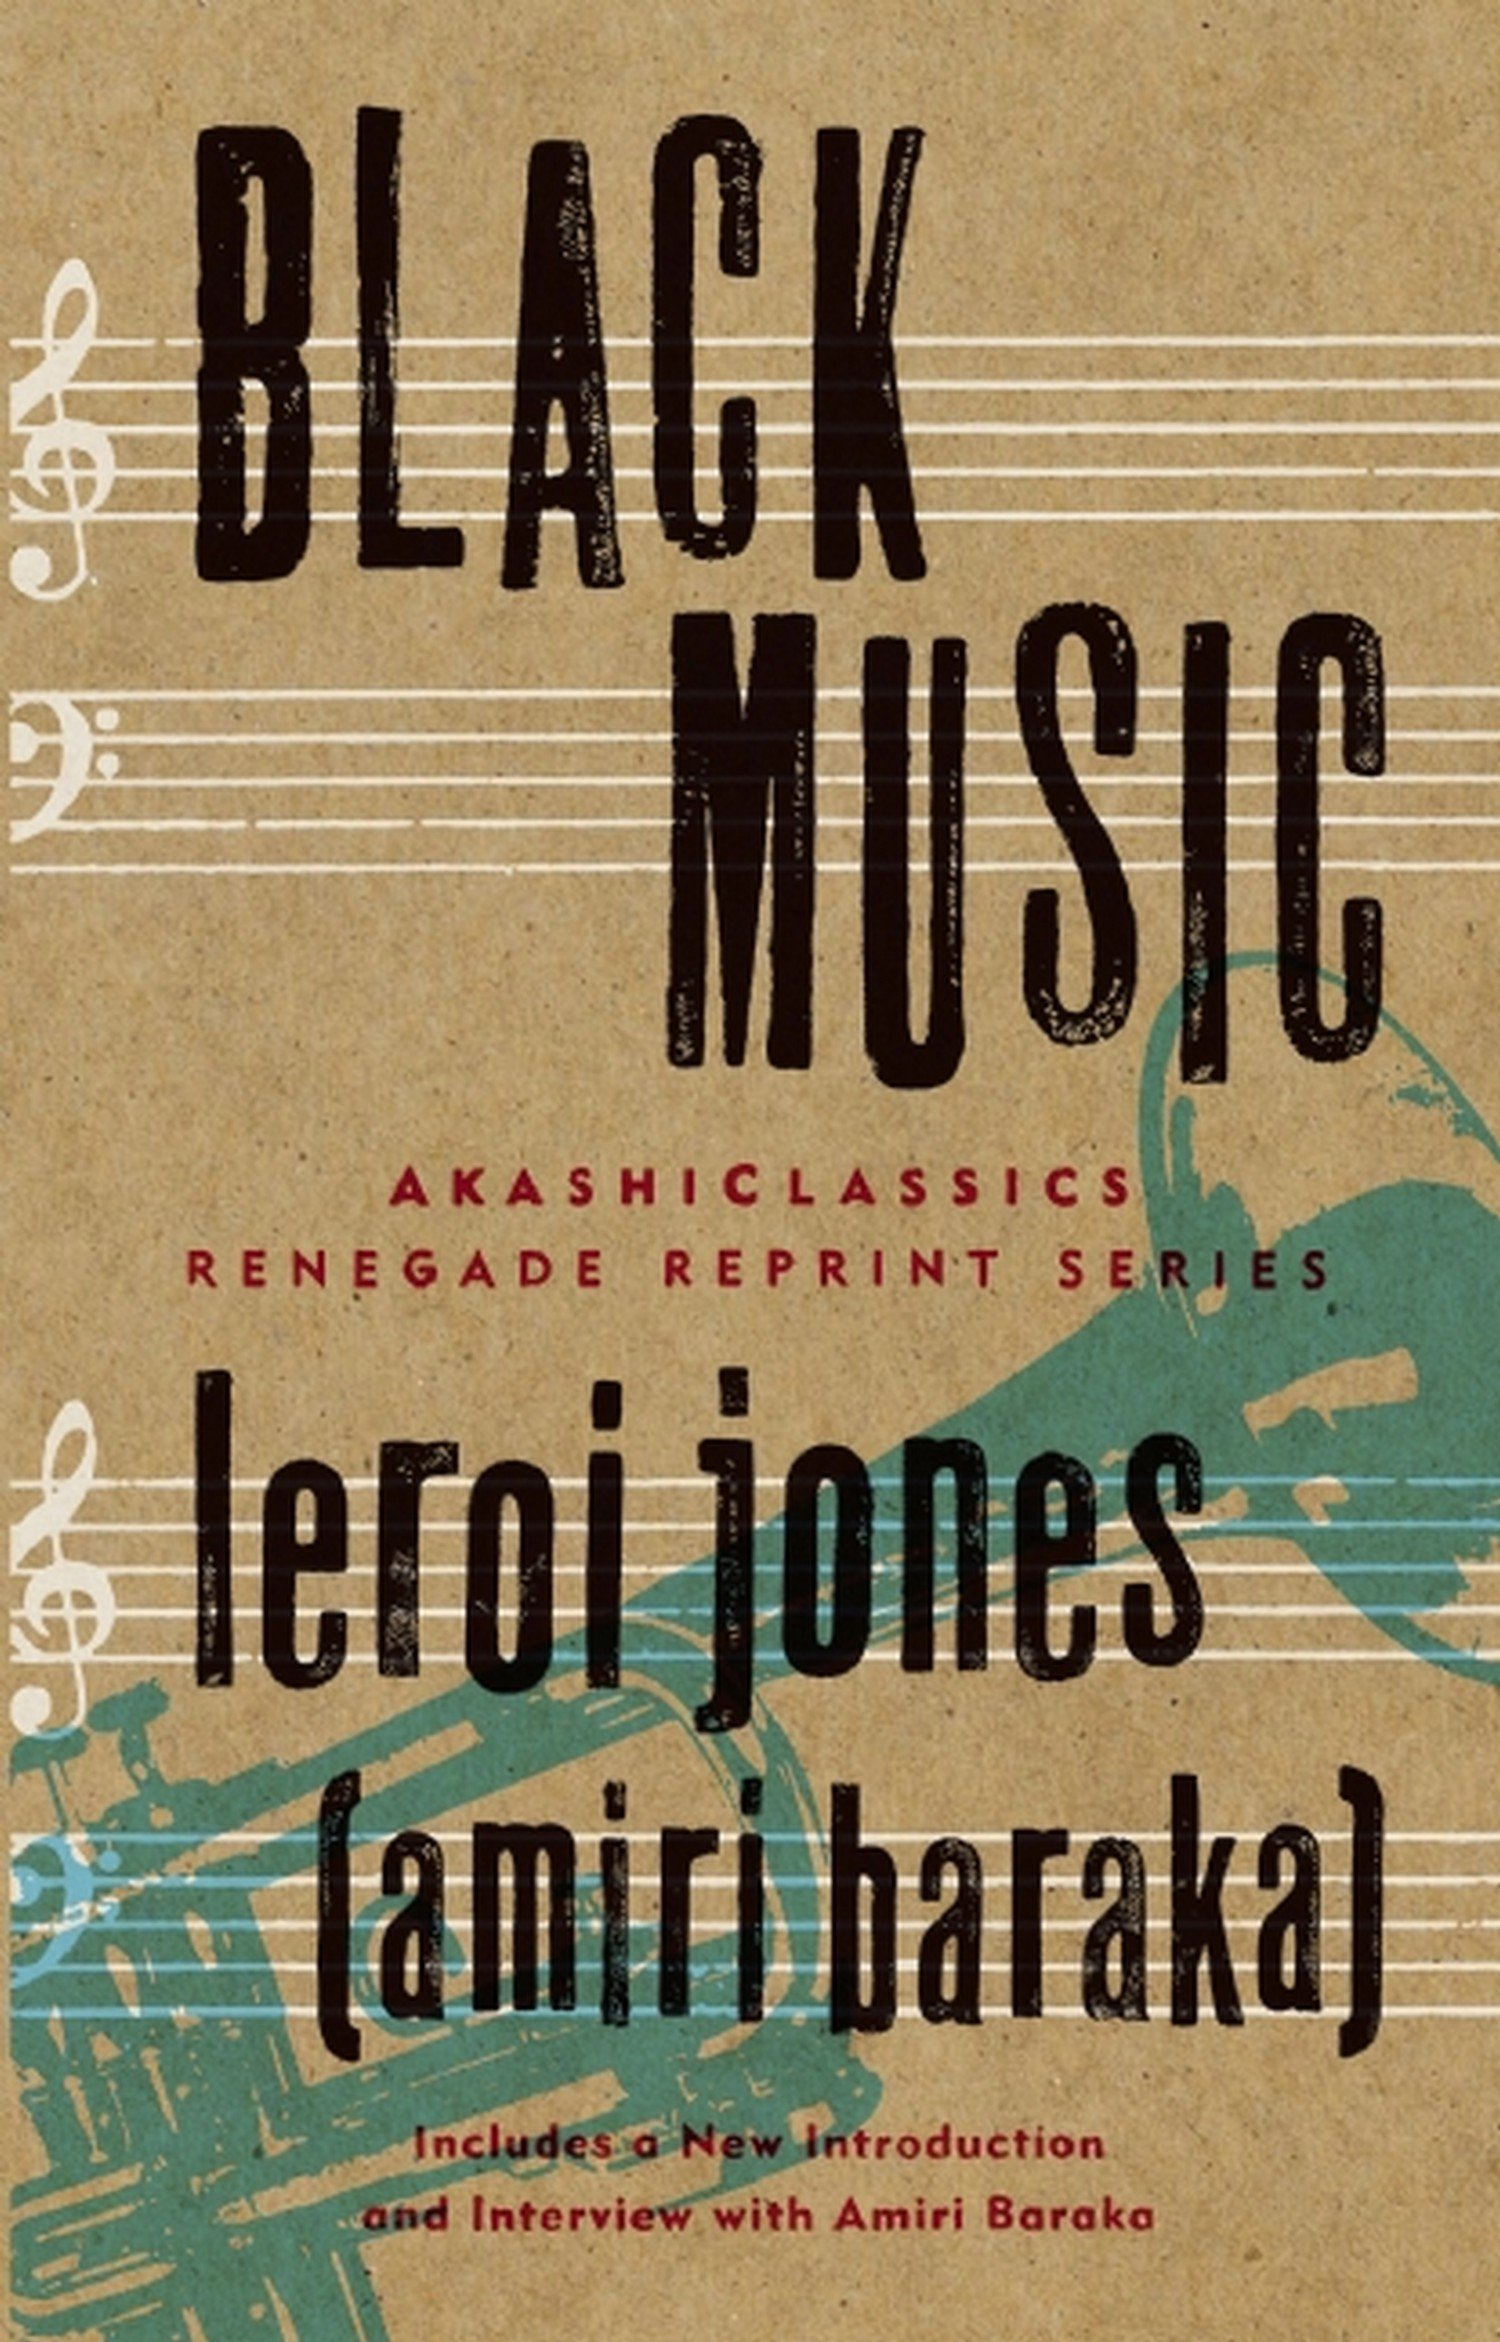 Black Music (AkashiClassics: Renegade Reprint Series): LeRoi Jones ...